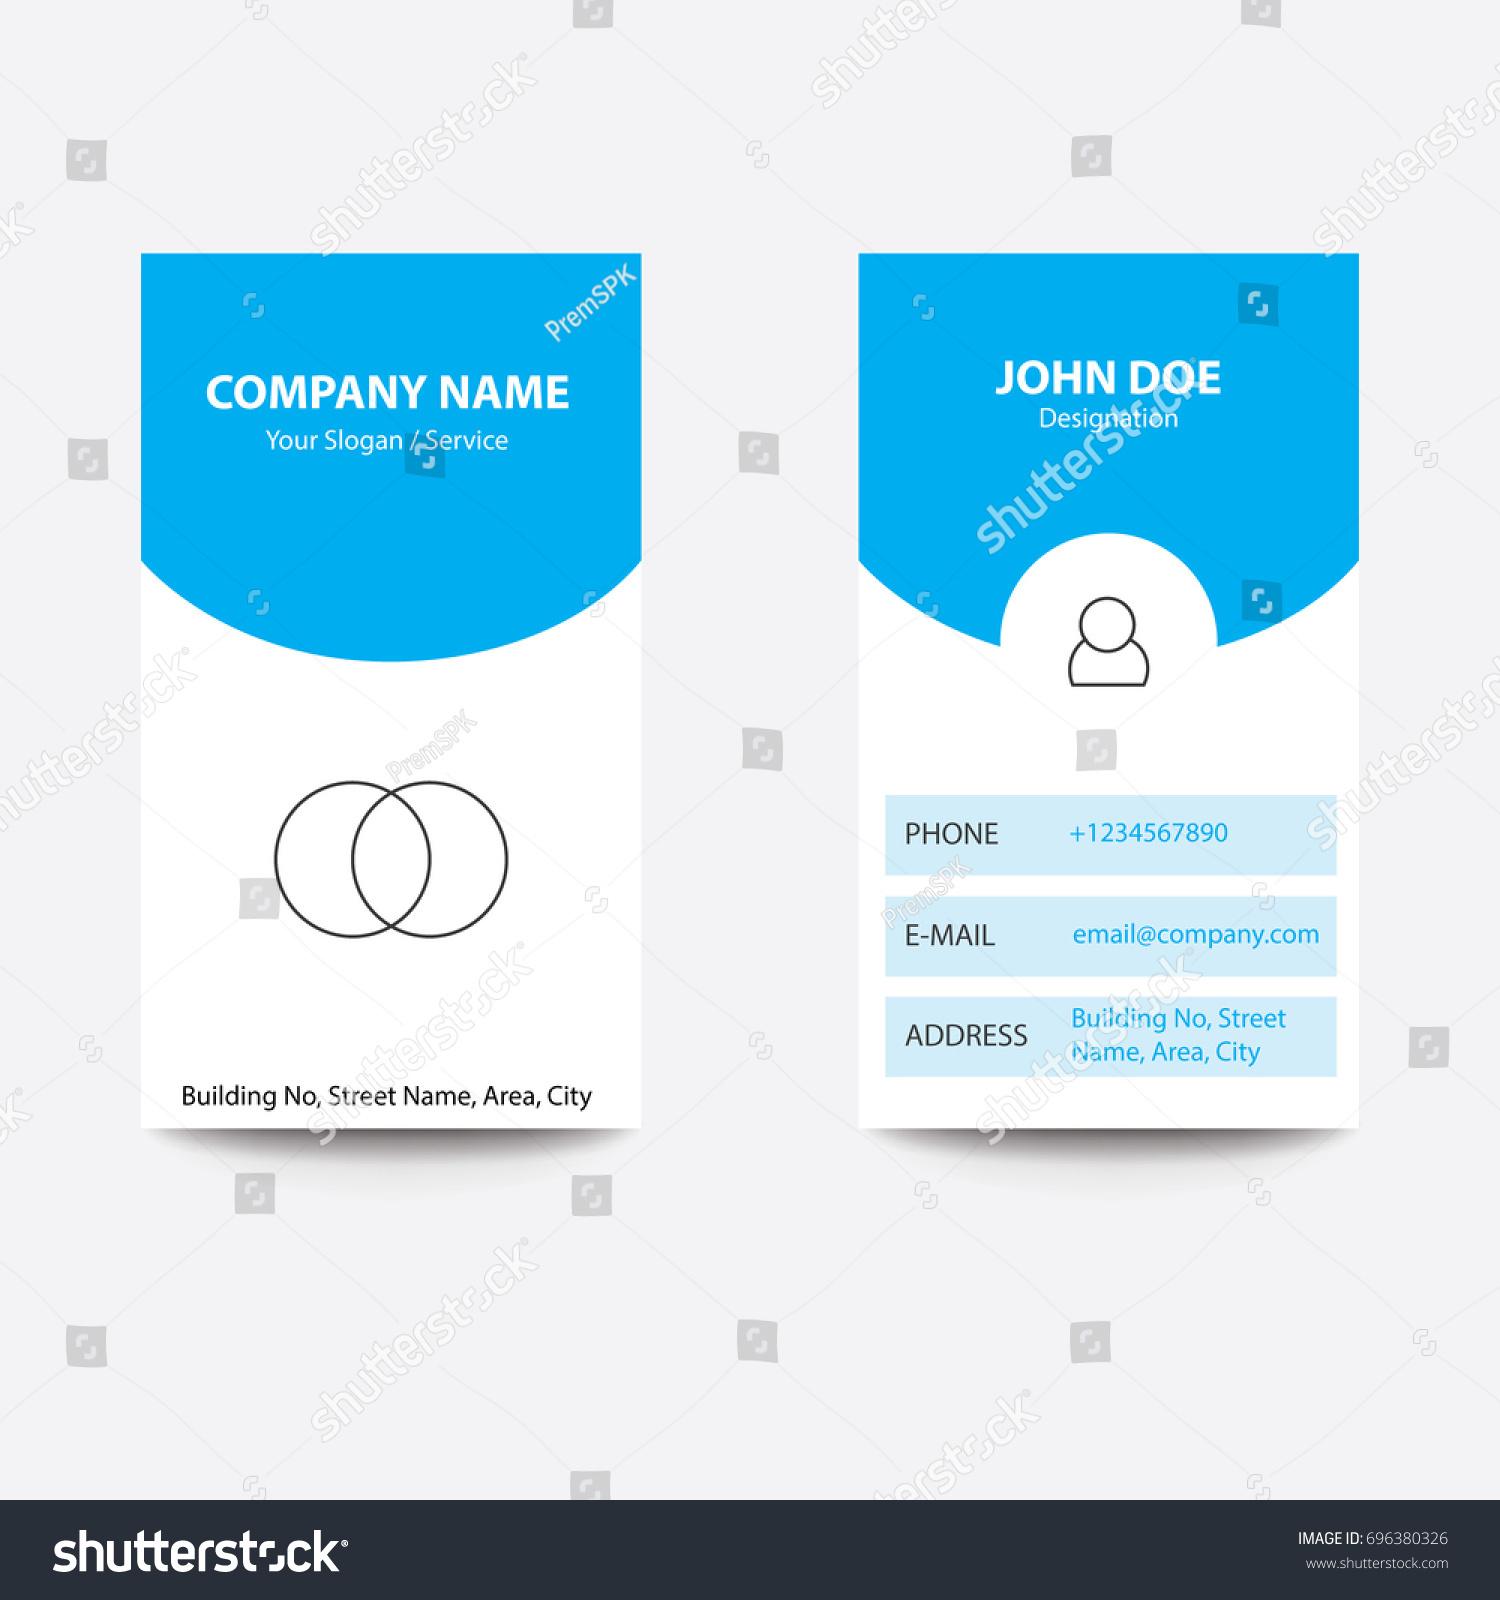 Modern concept app design business card stock vector royalty free modern concept app design business card app developer blue color reheart Image collections